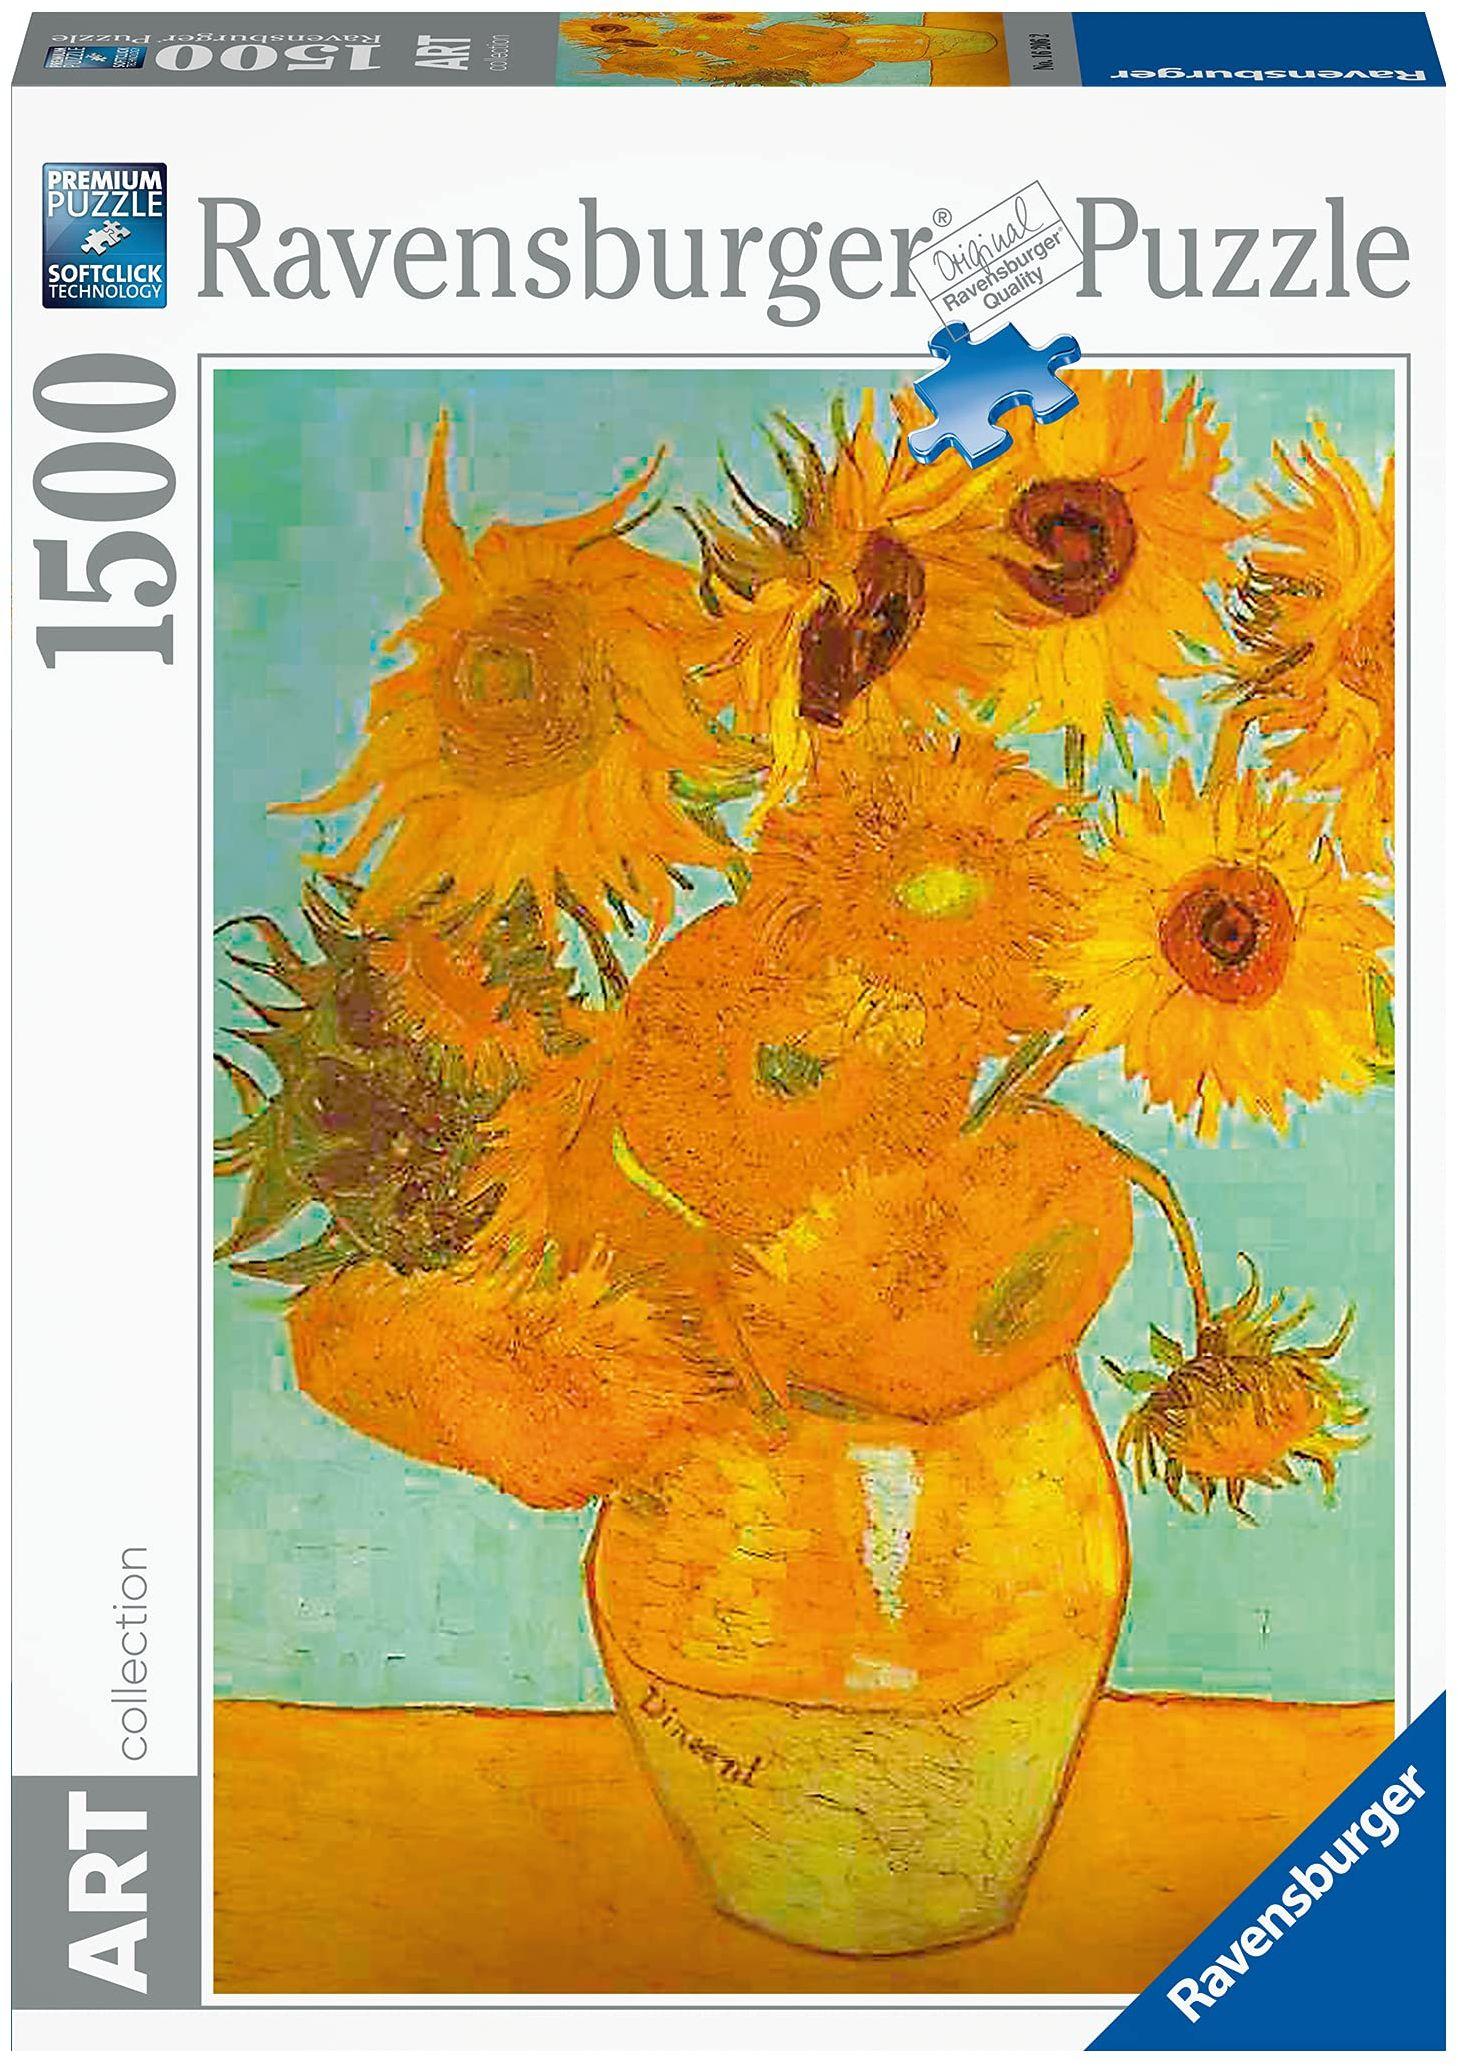 Ravensburger Puzzle 1500 części - wazon z słonecznikami - V.Van Gogh (kod 16206)